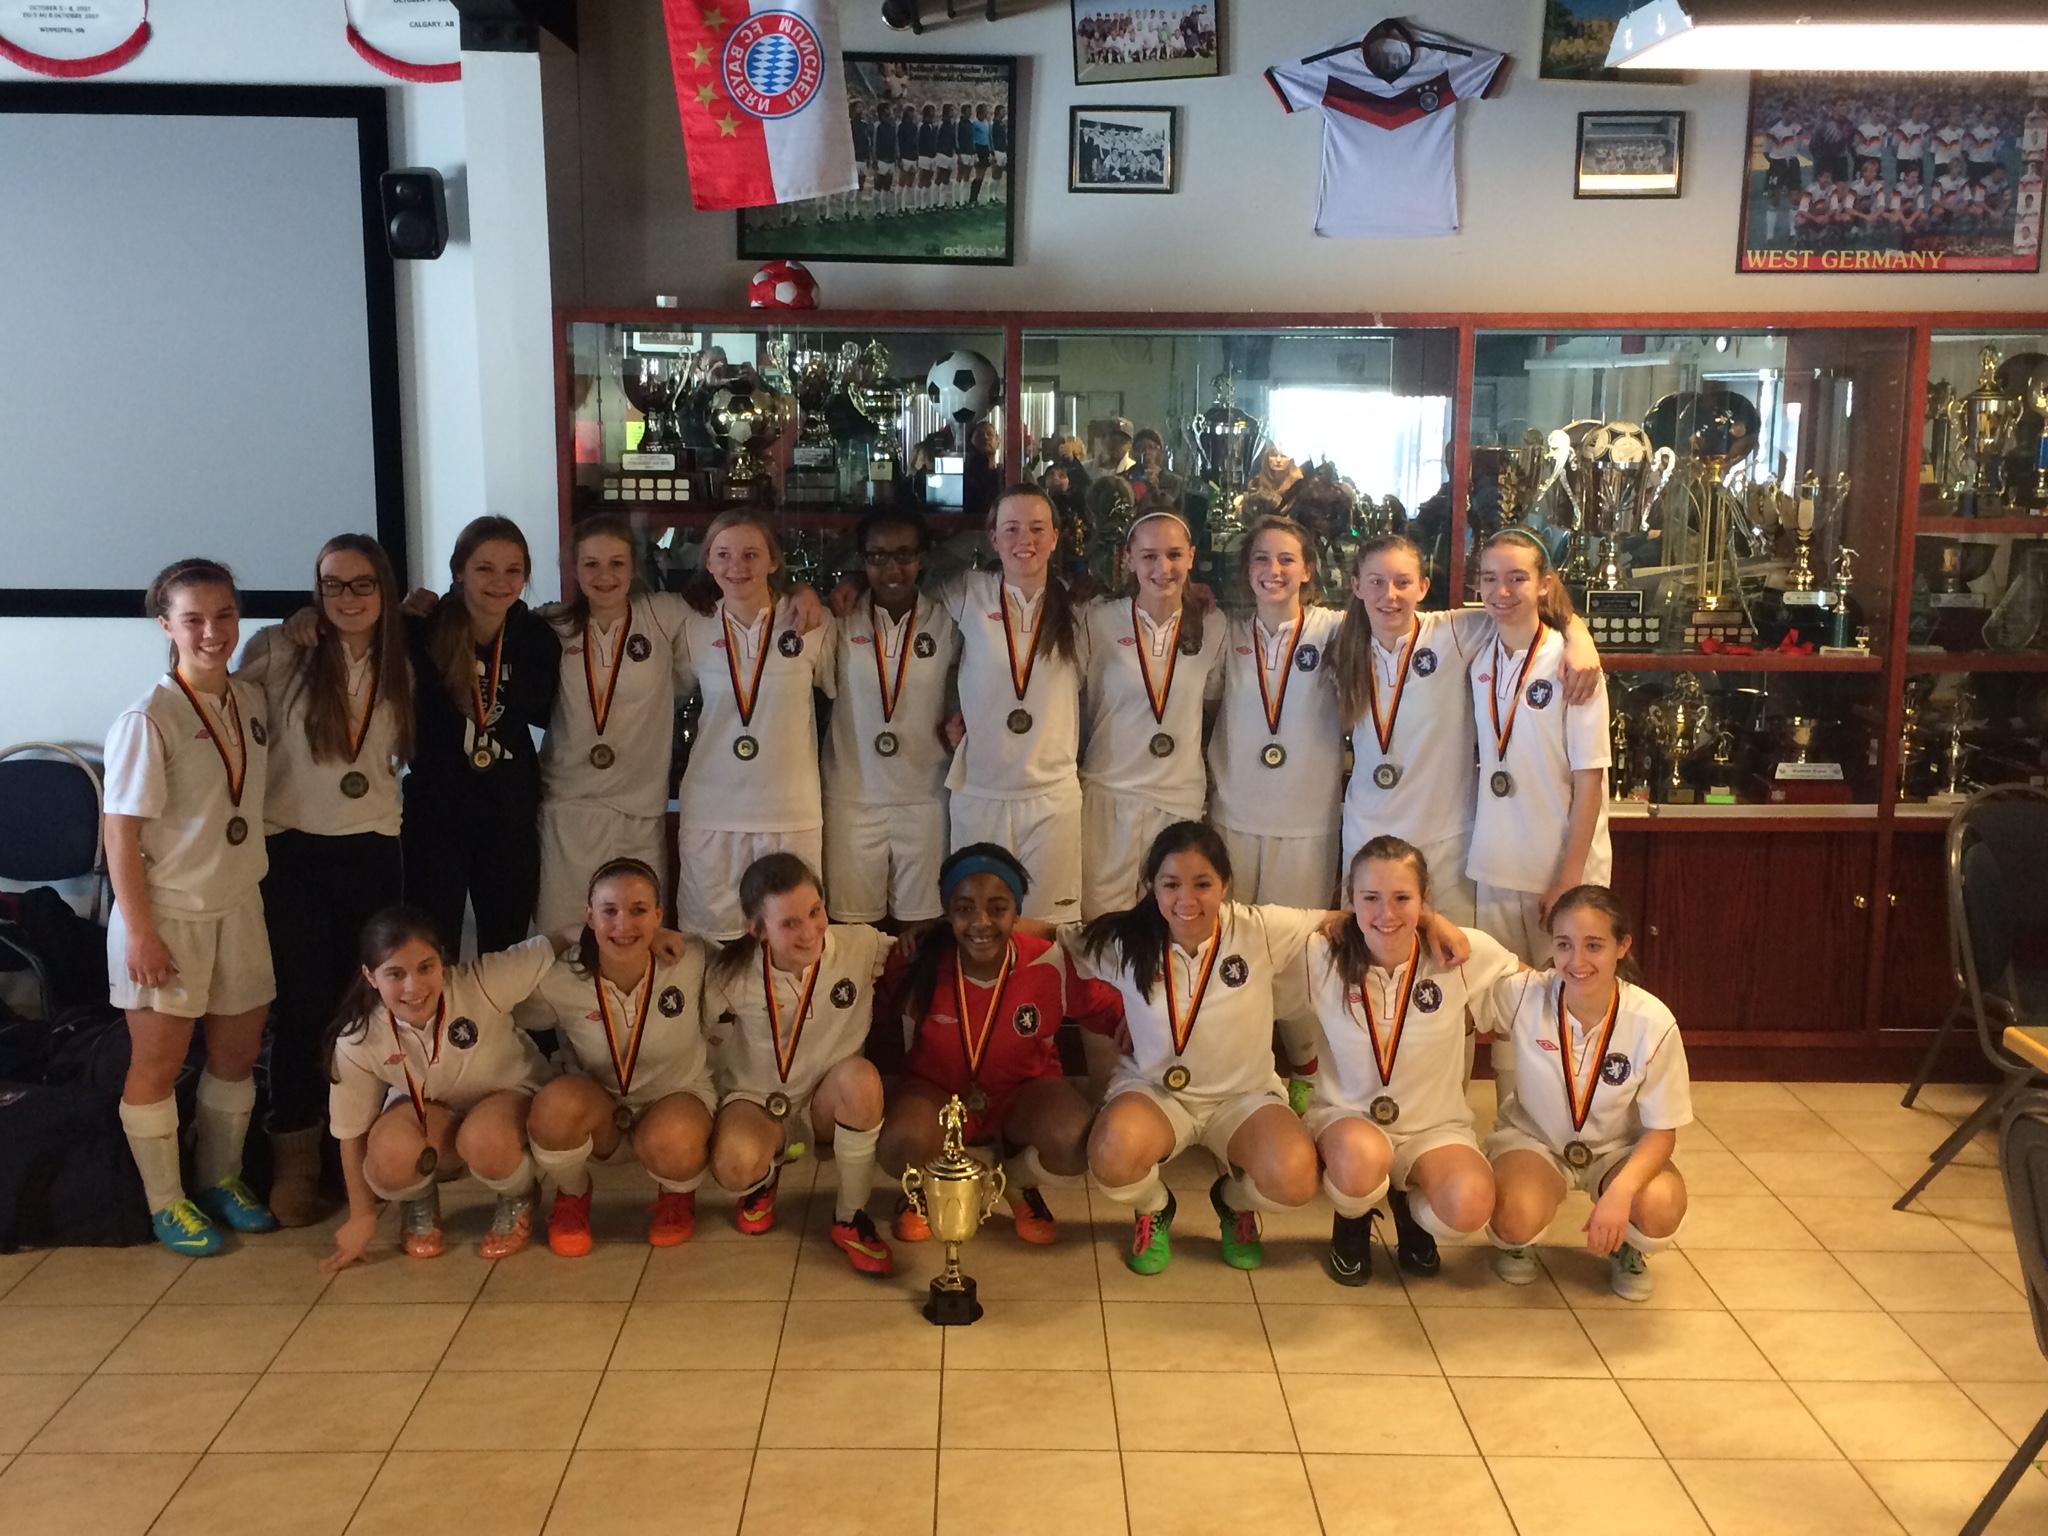 Edmonton Scottish United Soccer Club - 2000 (U16 T2 Girls) - Gold at U16 T1 Victoria Soccer Club's 7 v 7 Tournament